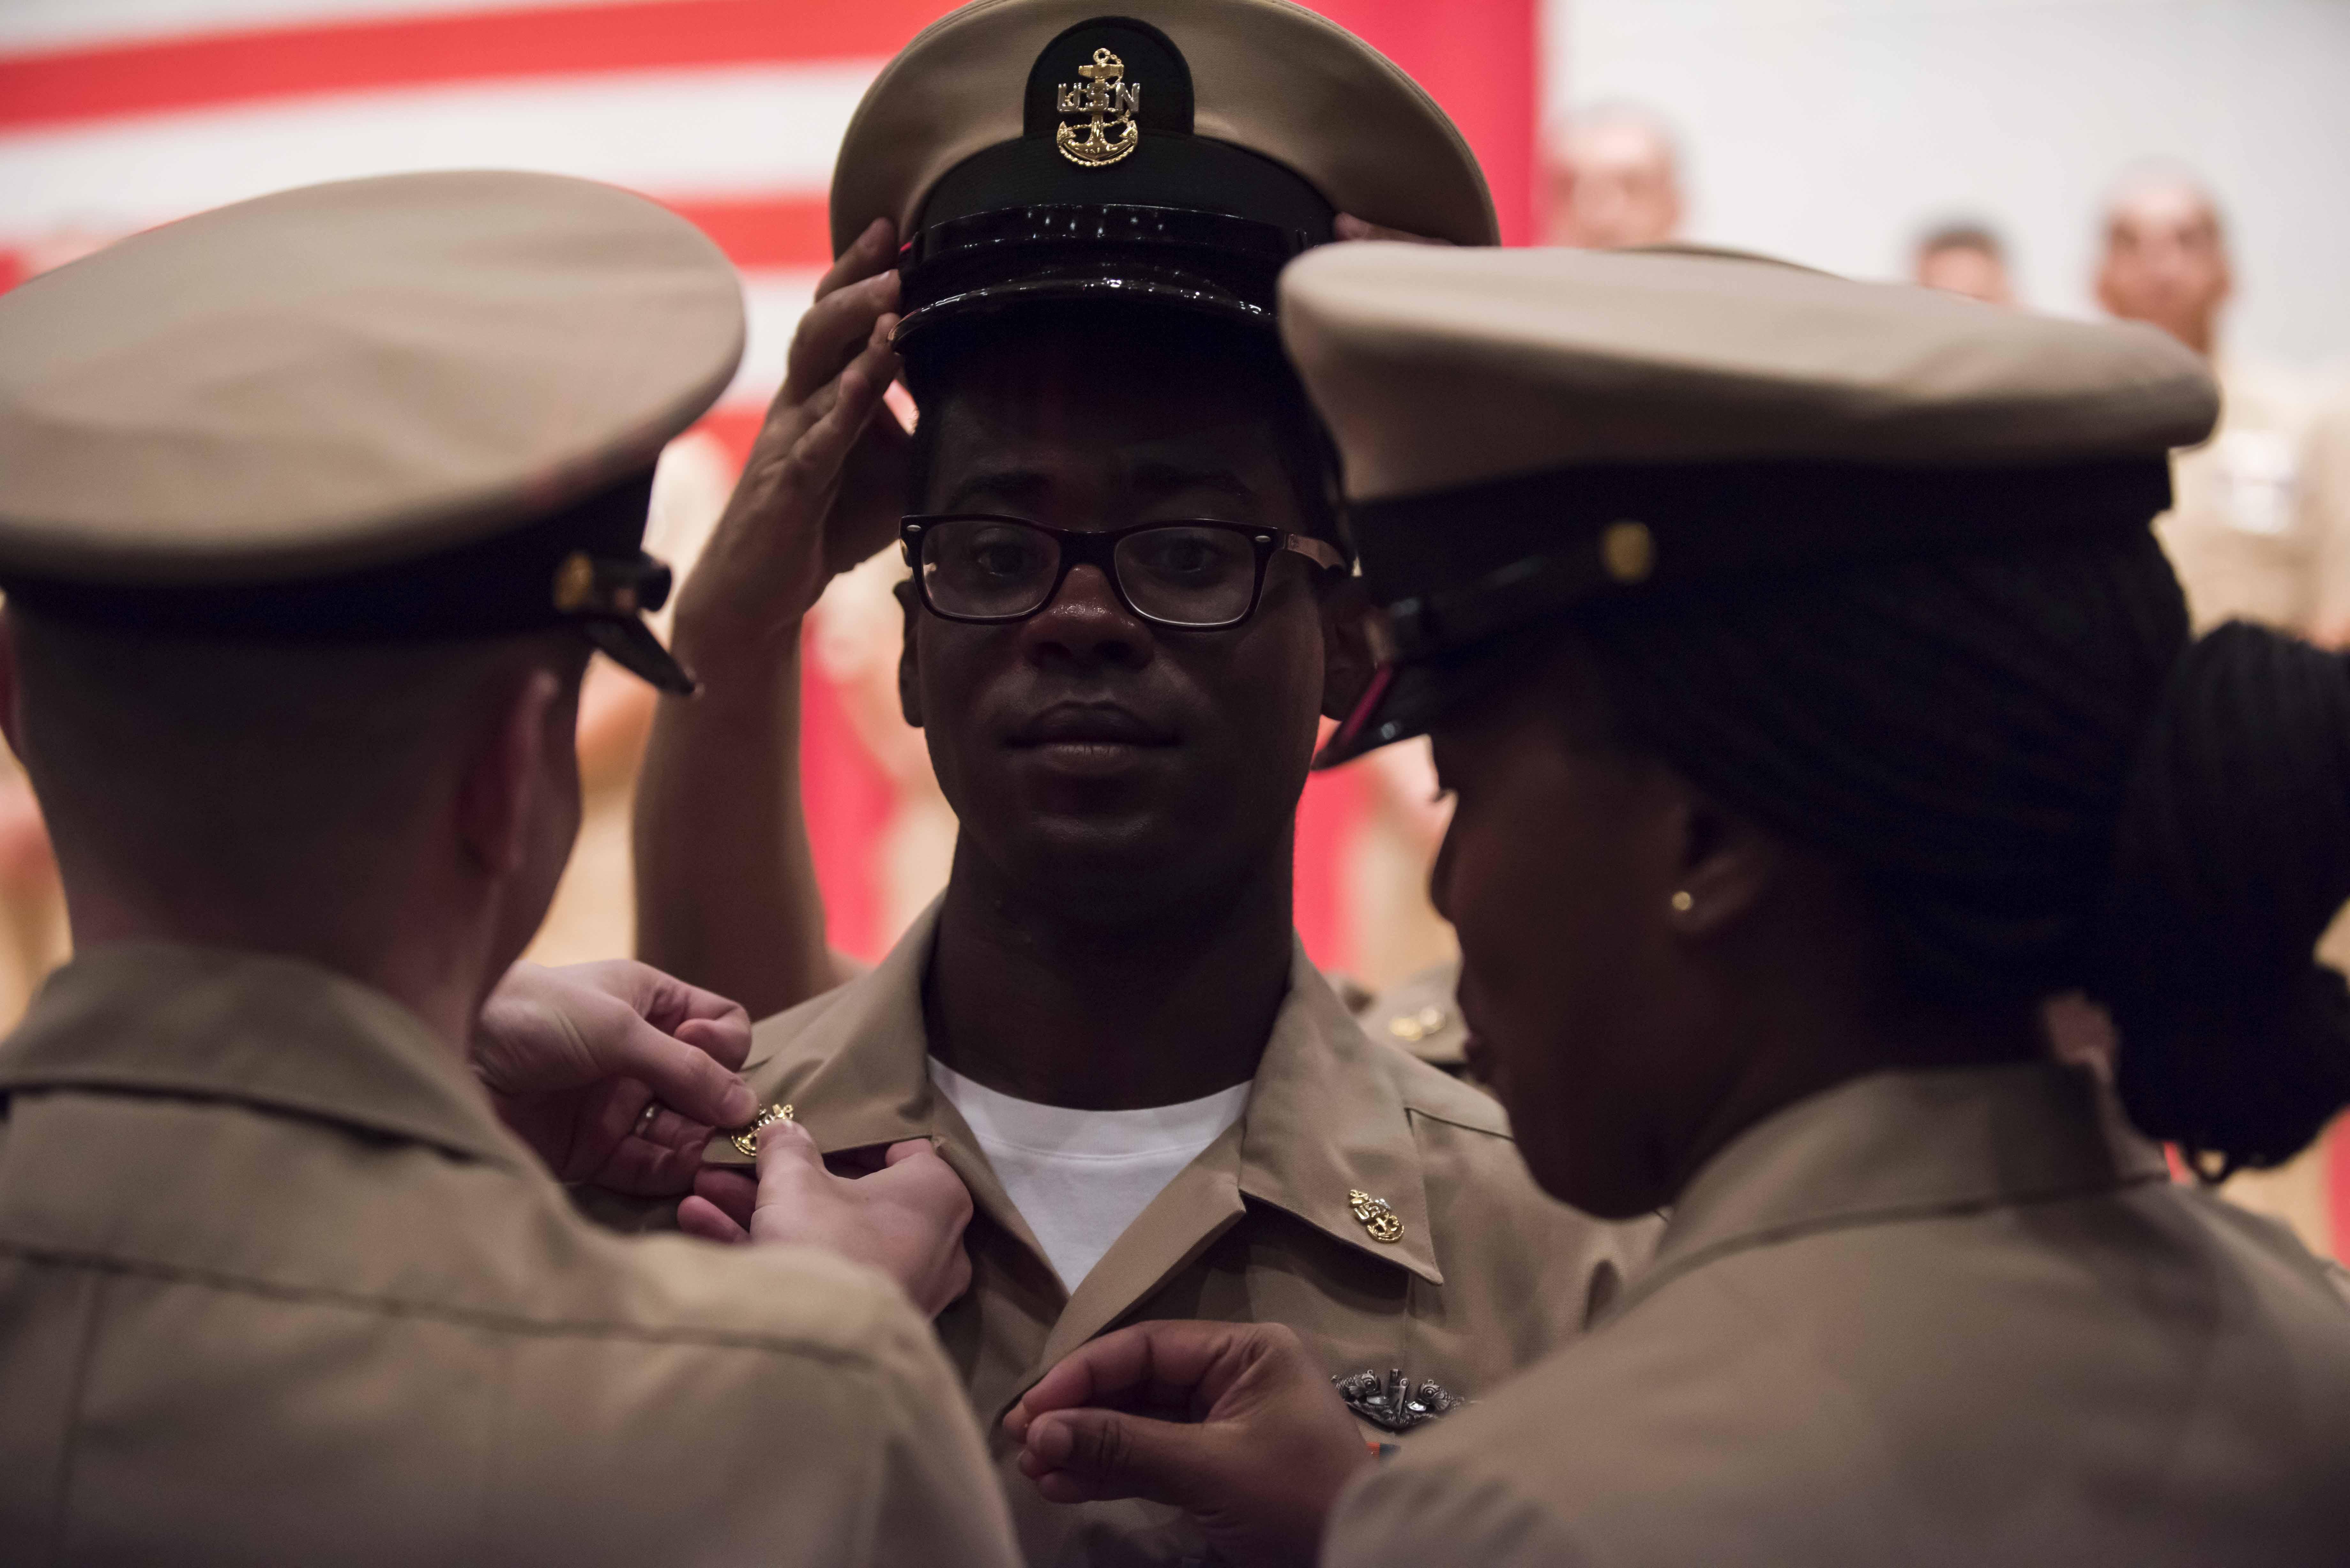 2019 CSG7 Chief Pinning Ceremony